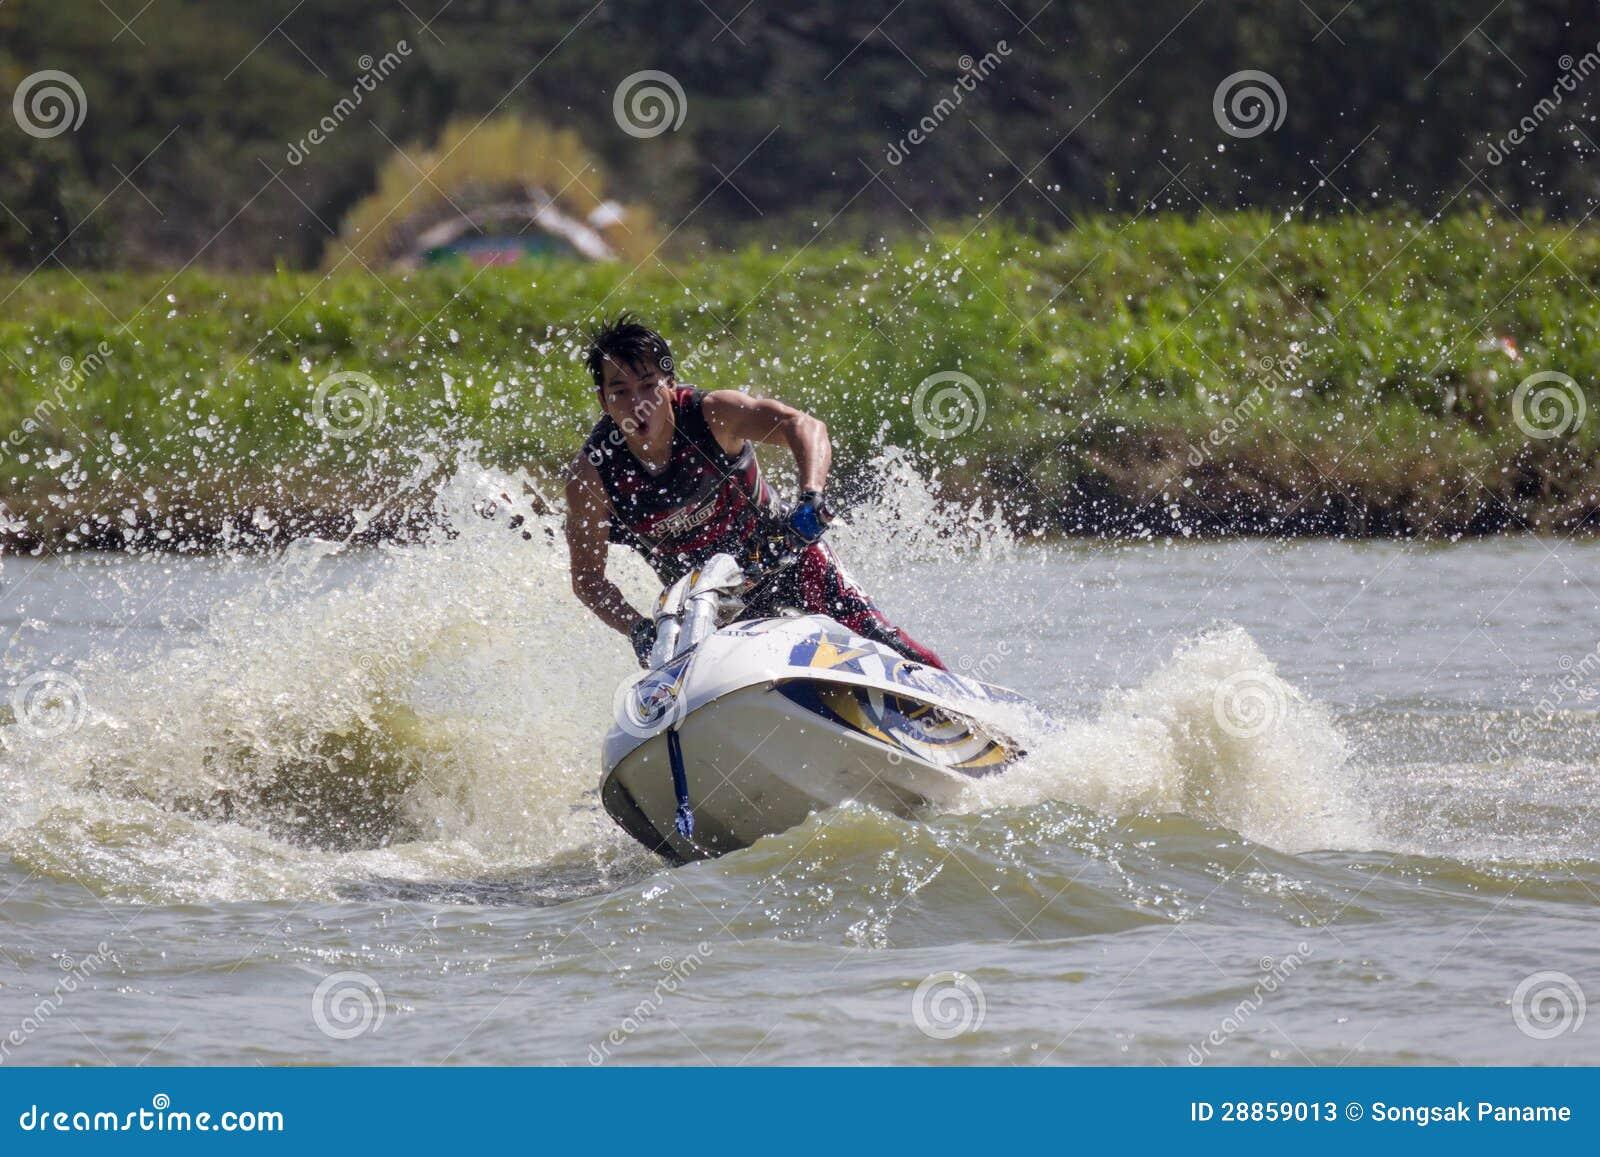 Action jet ski & boat rentals daytona beach fl news